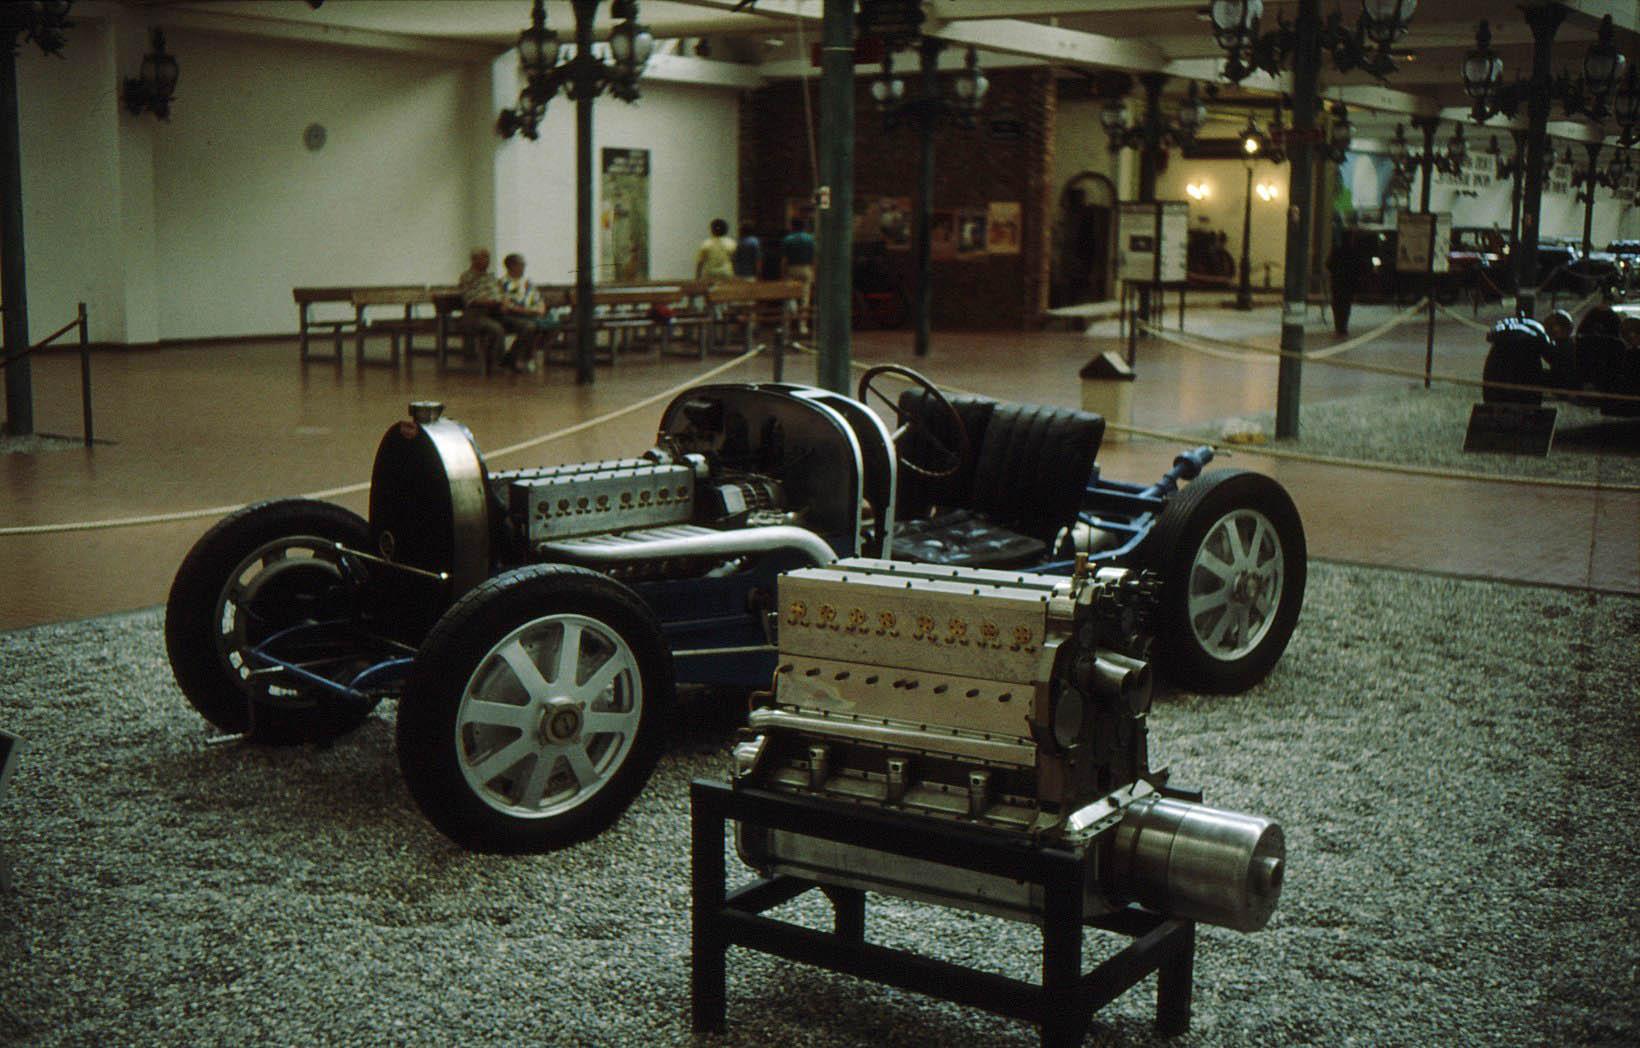 File:Bugatti chassi.jpg - Wikimedia Commons